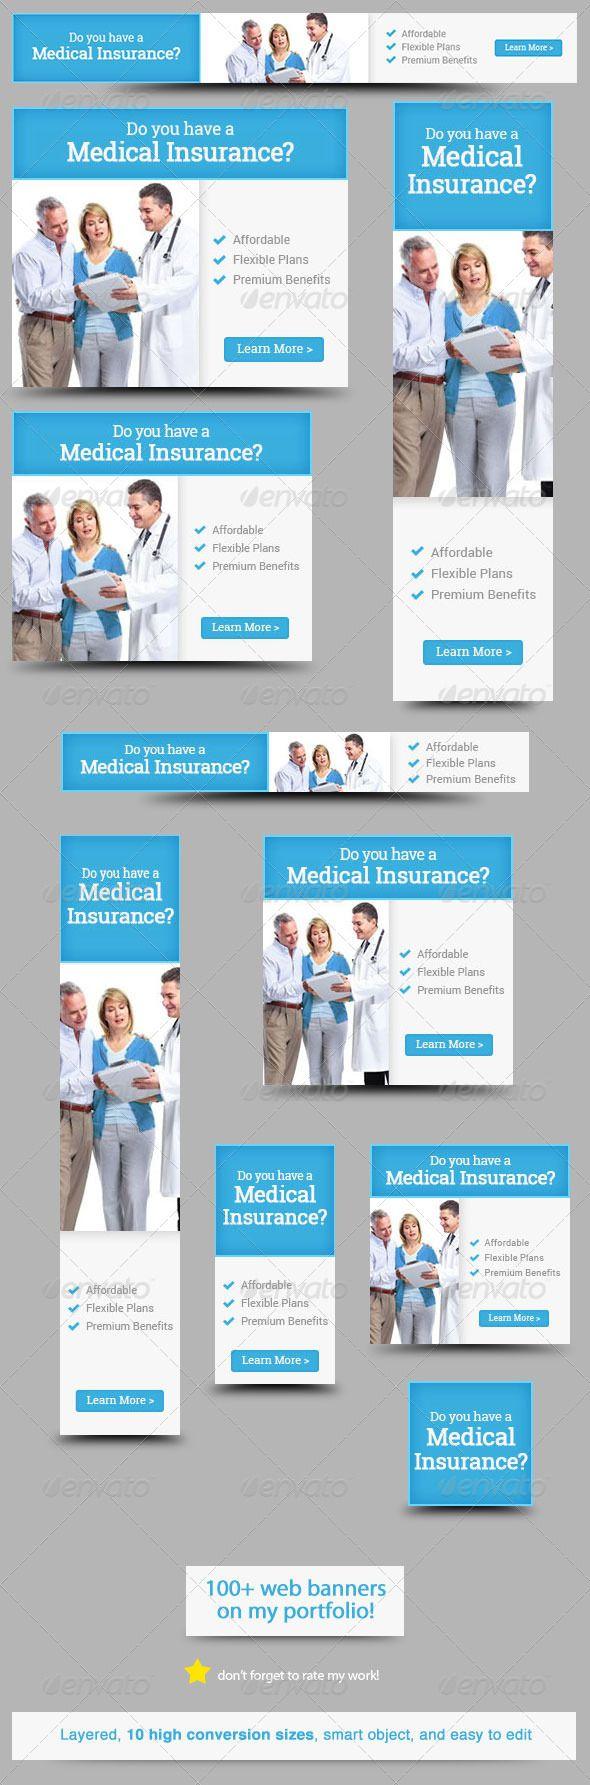 Design banner minimalist - Buy Medical Insurance Web Banner Design By Admiral_adictus On Graphicriver Clean And Minimalist Medical Insurance Web Banner Design Banner Design